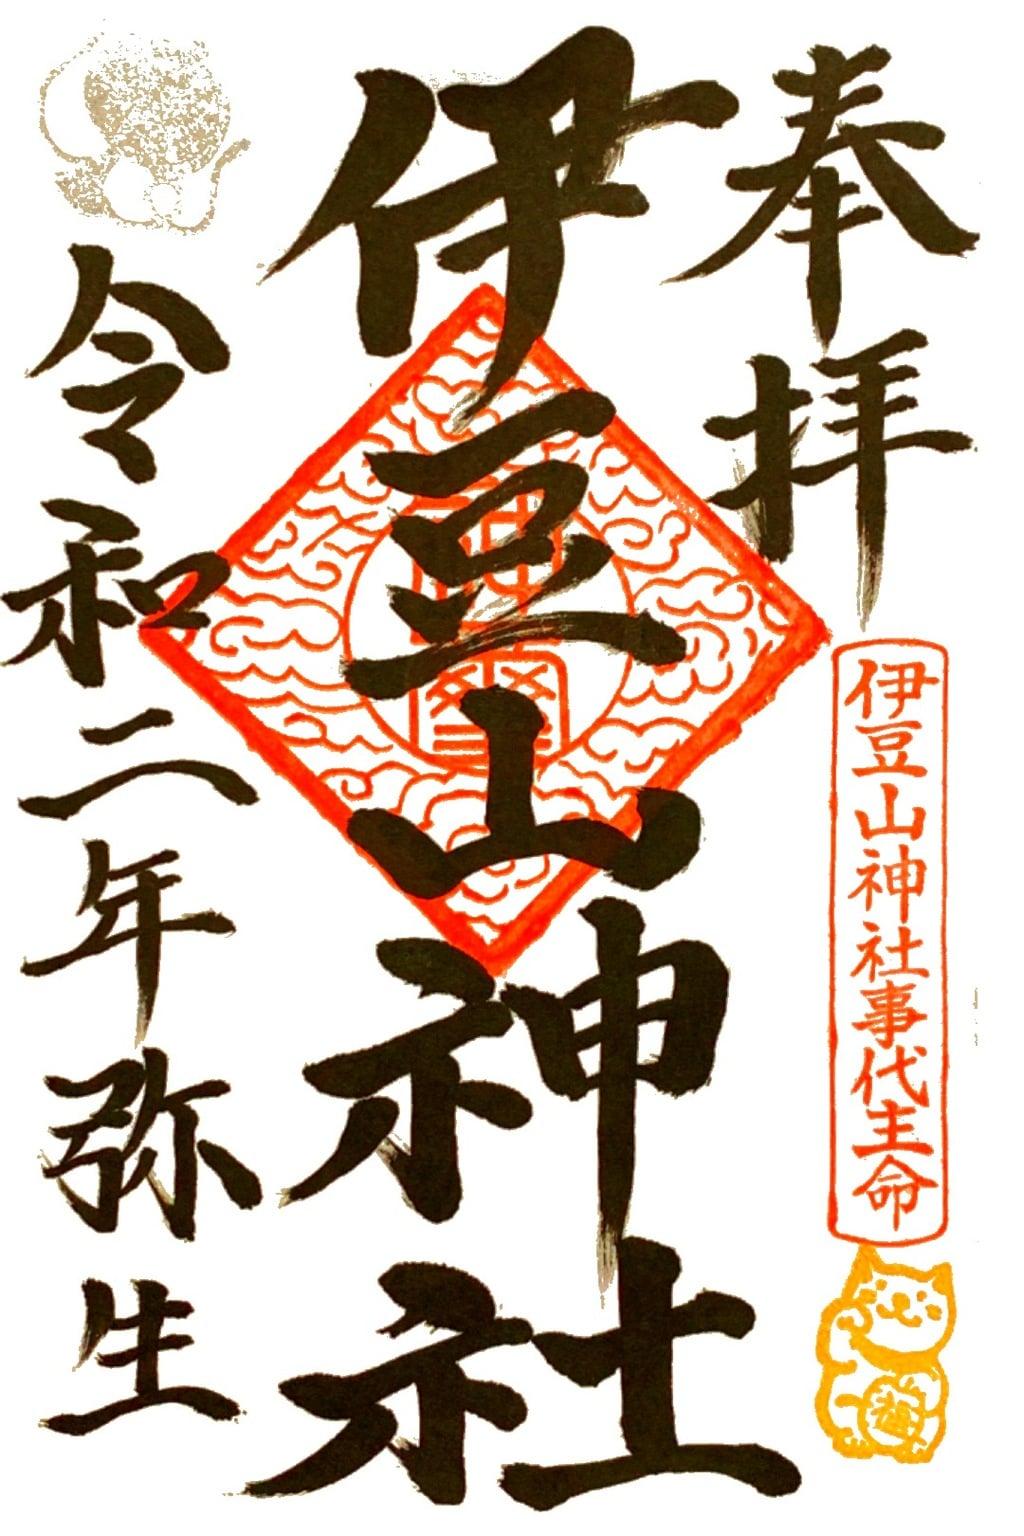 伊豆山神社 里宮の御朱印